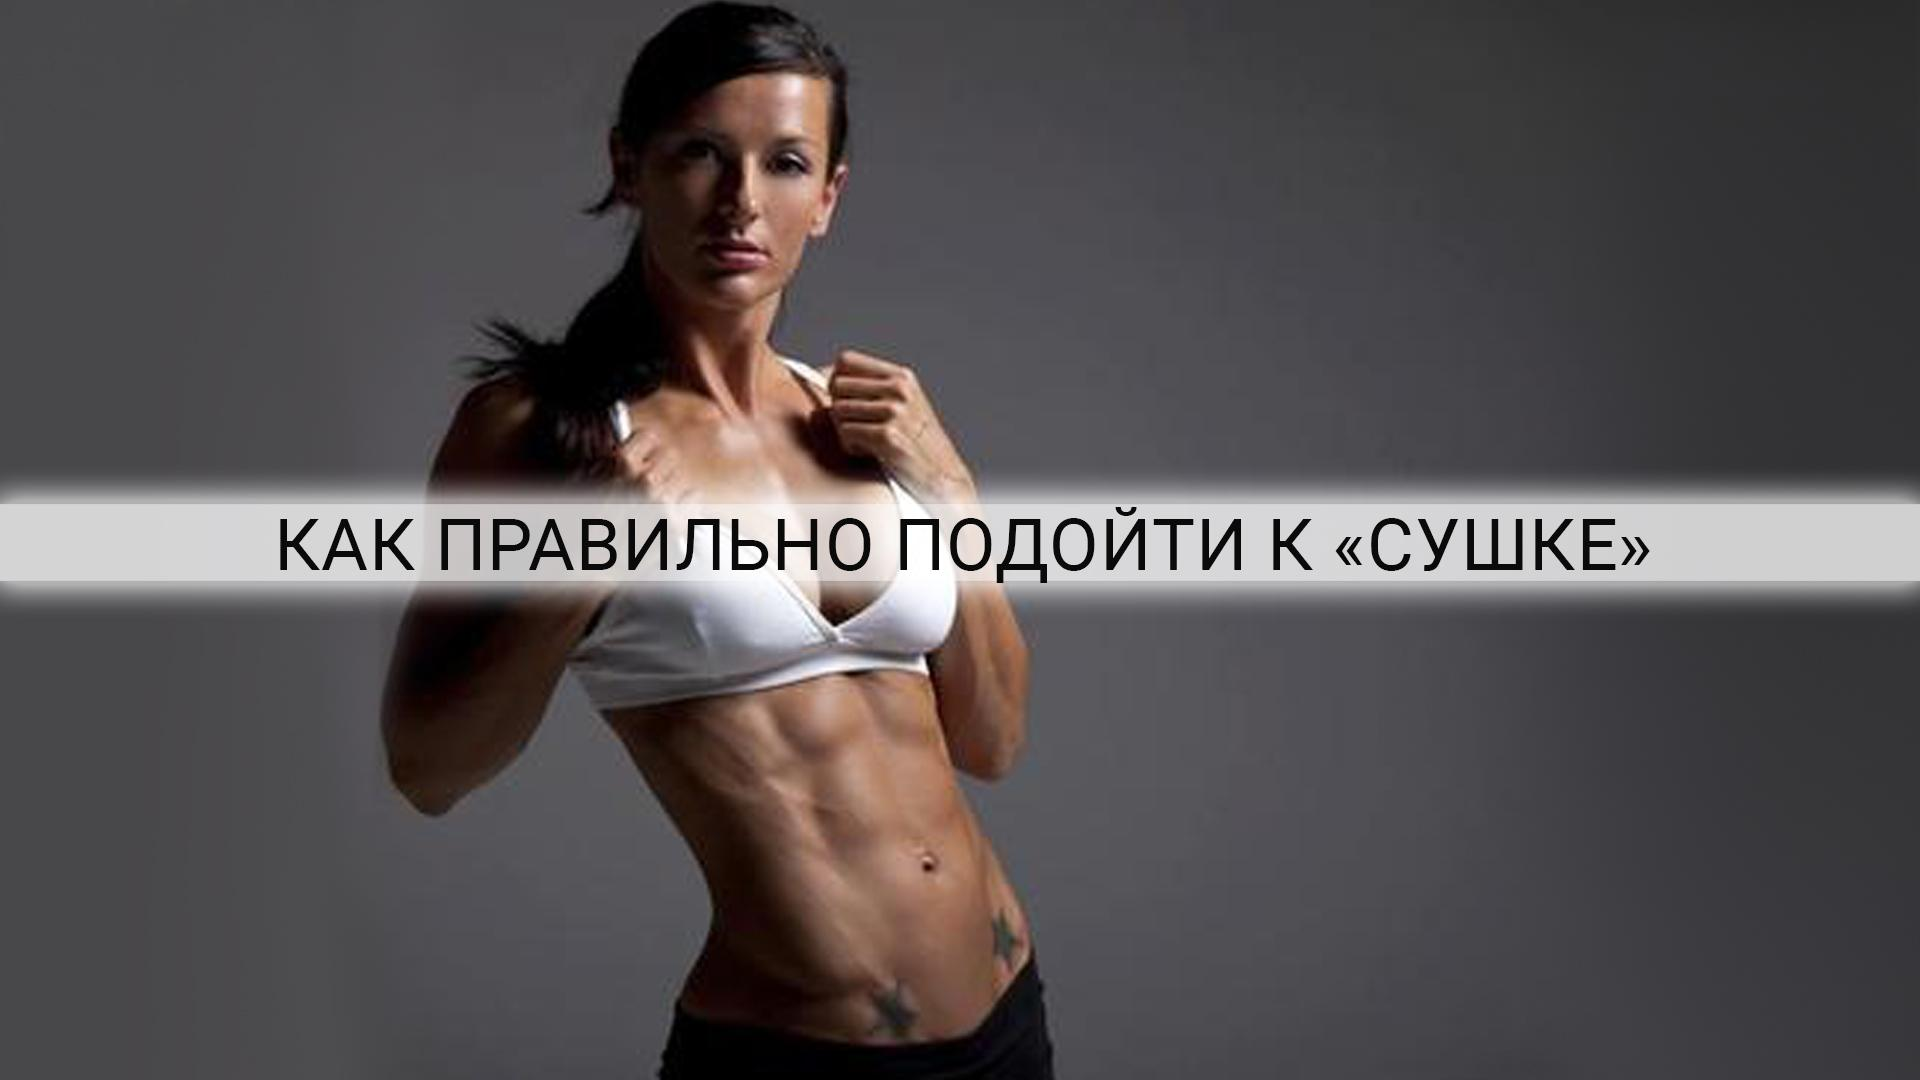 Правильно сушка тела